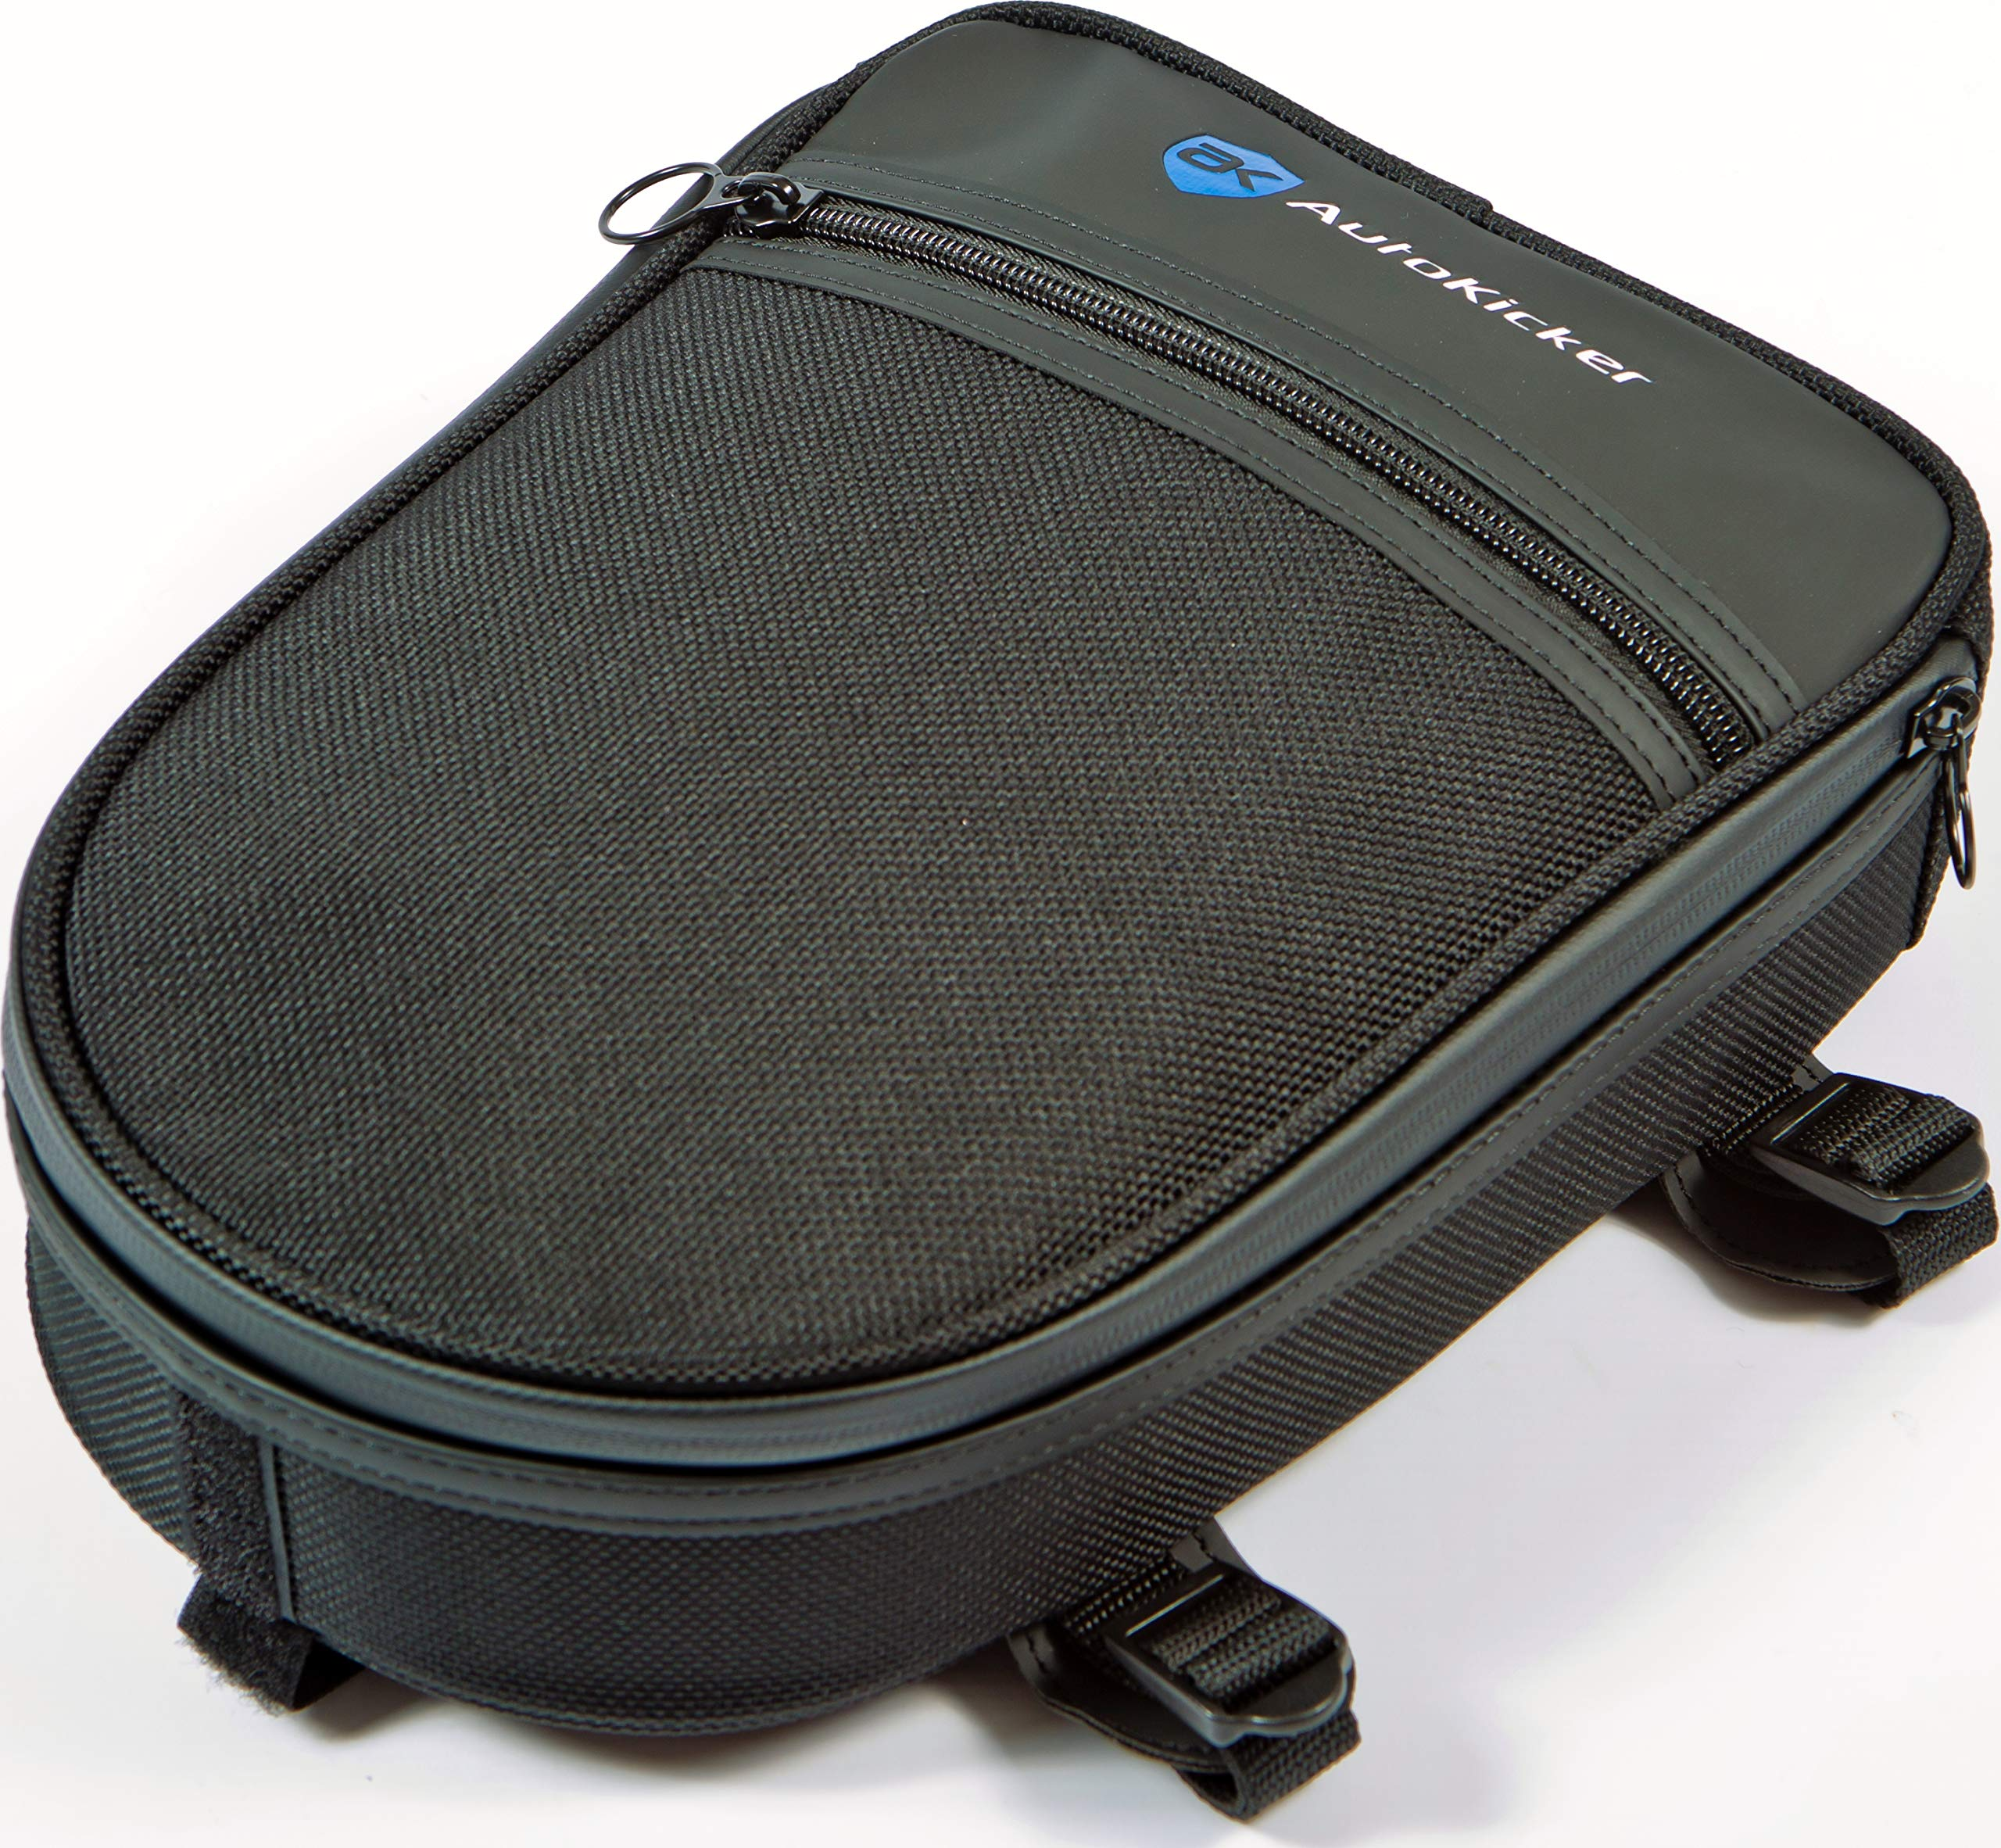 Autokicker® Mini Tail Pack/Seat Bag For Motorcycle & Motorbikes